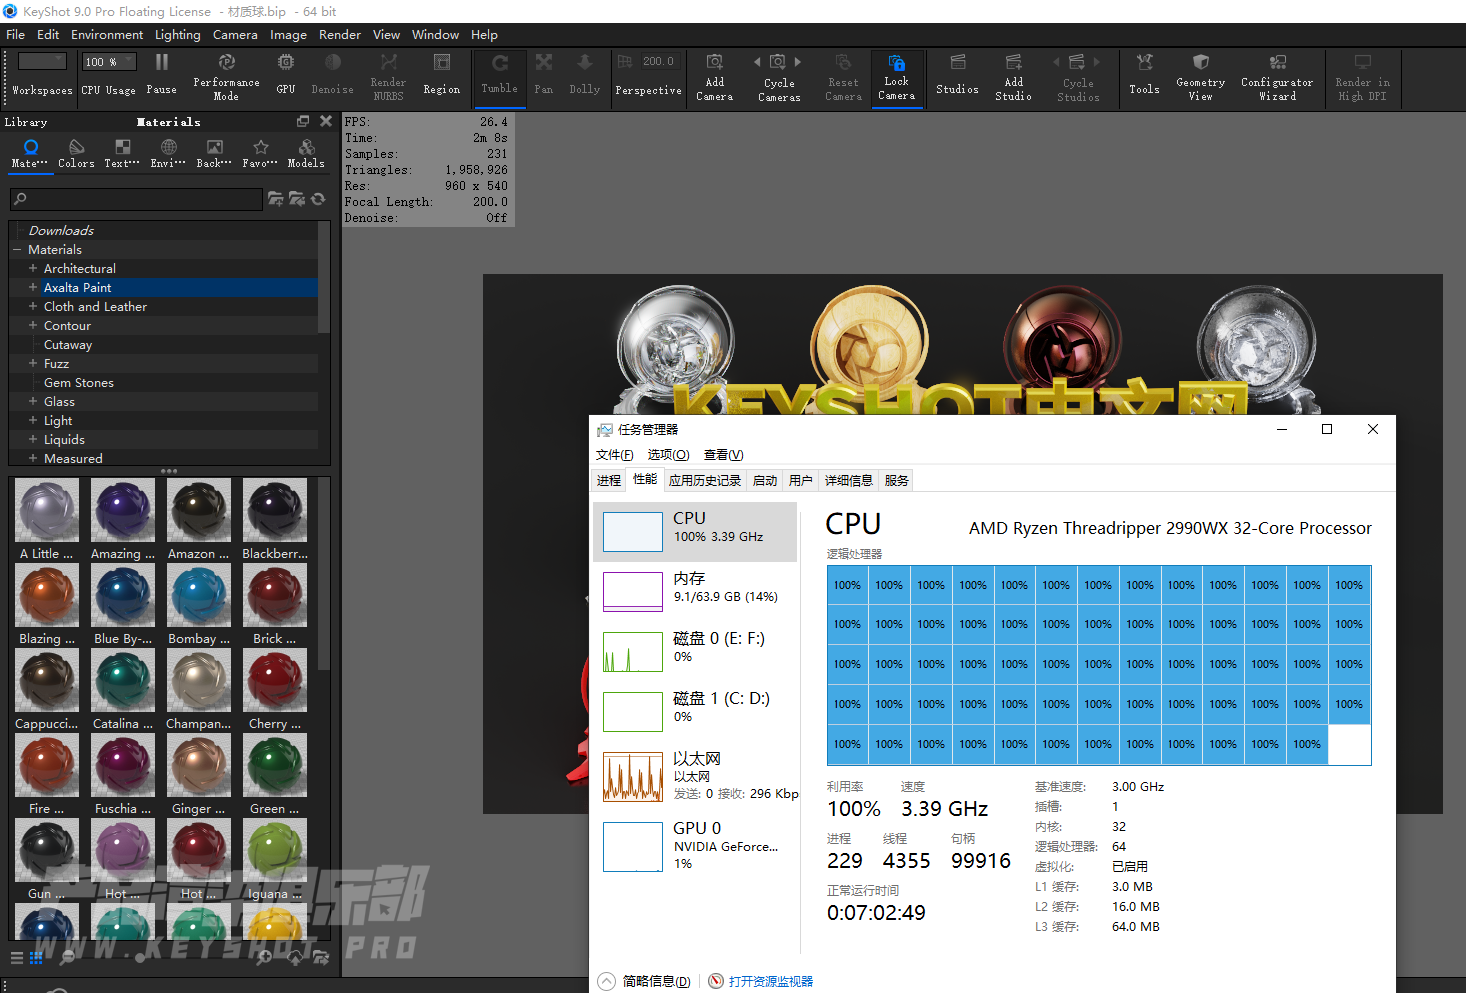 全站最强单CPU AMD 2990wx   NVIDA 1070 8G  Keyshot9 评测2